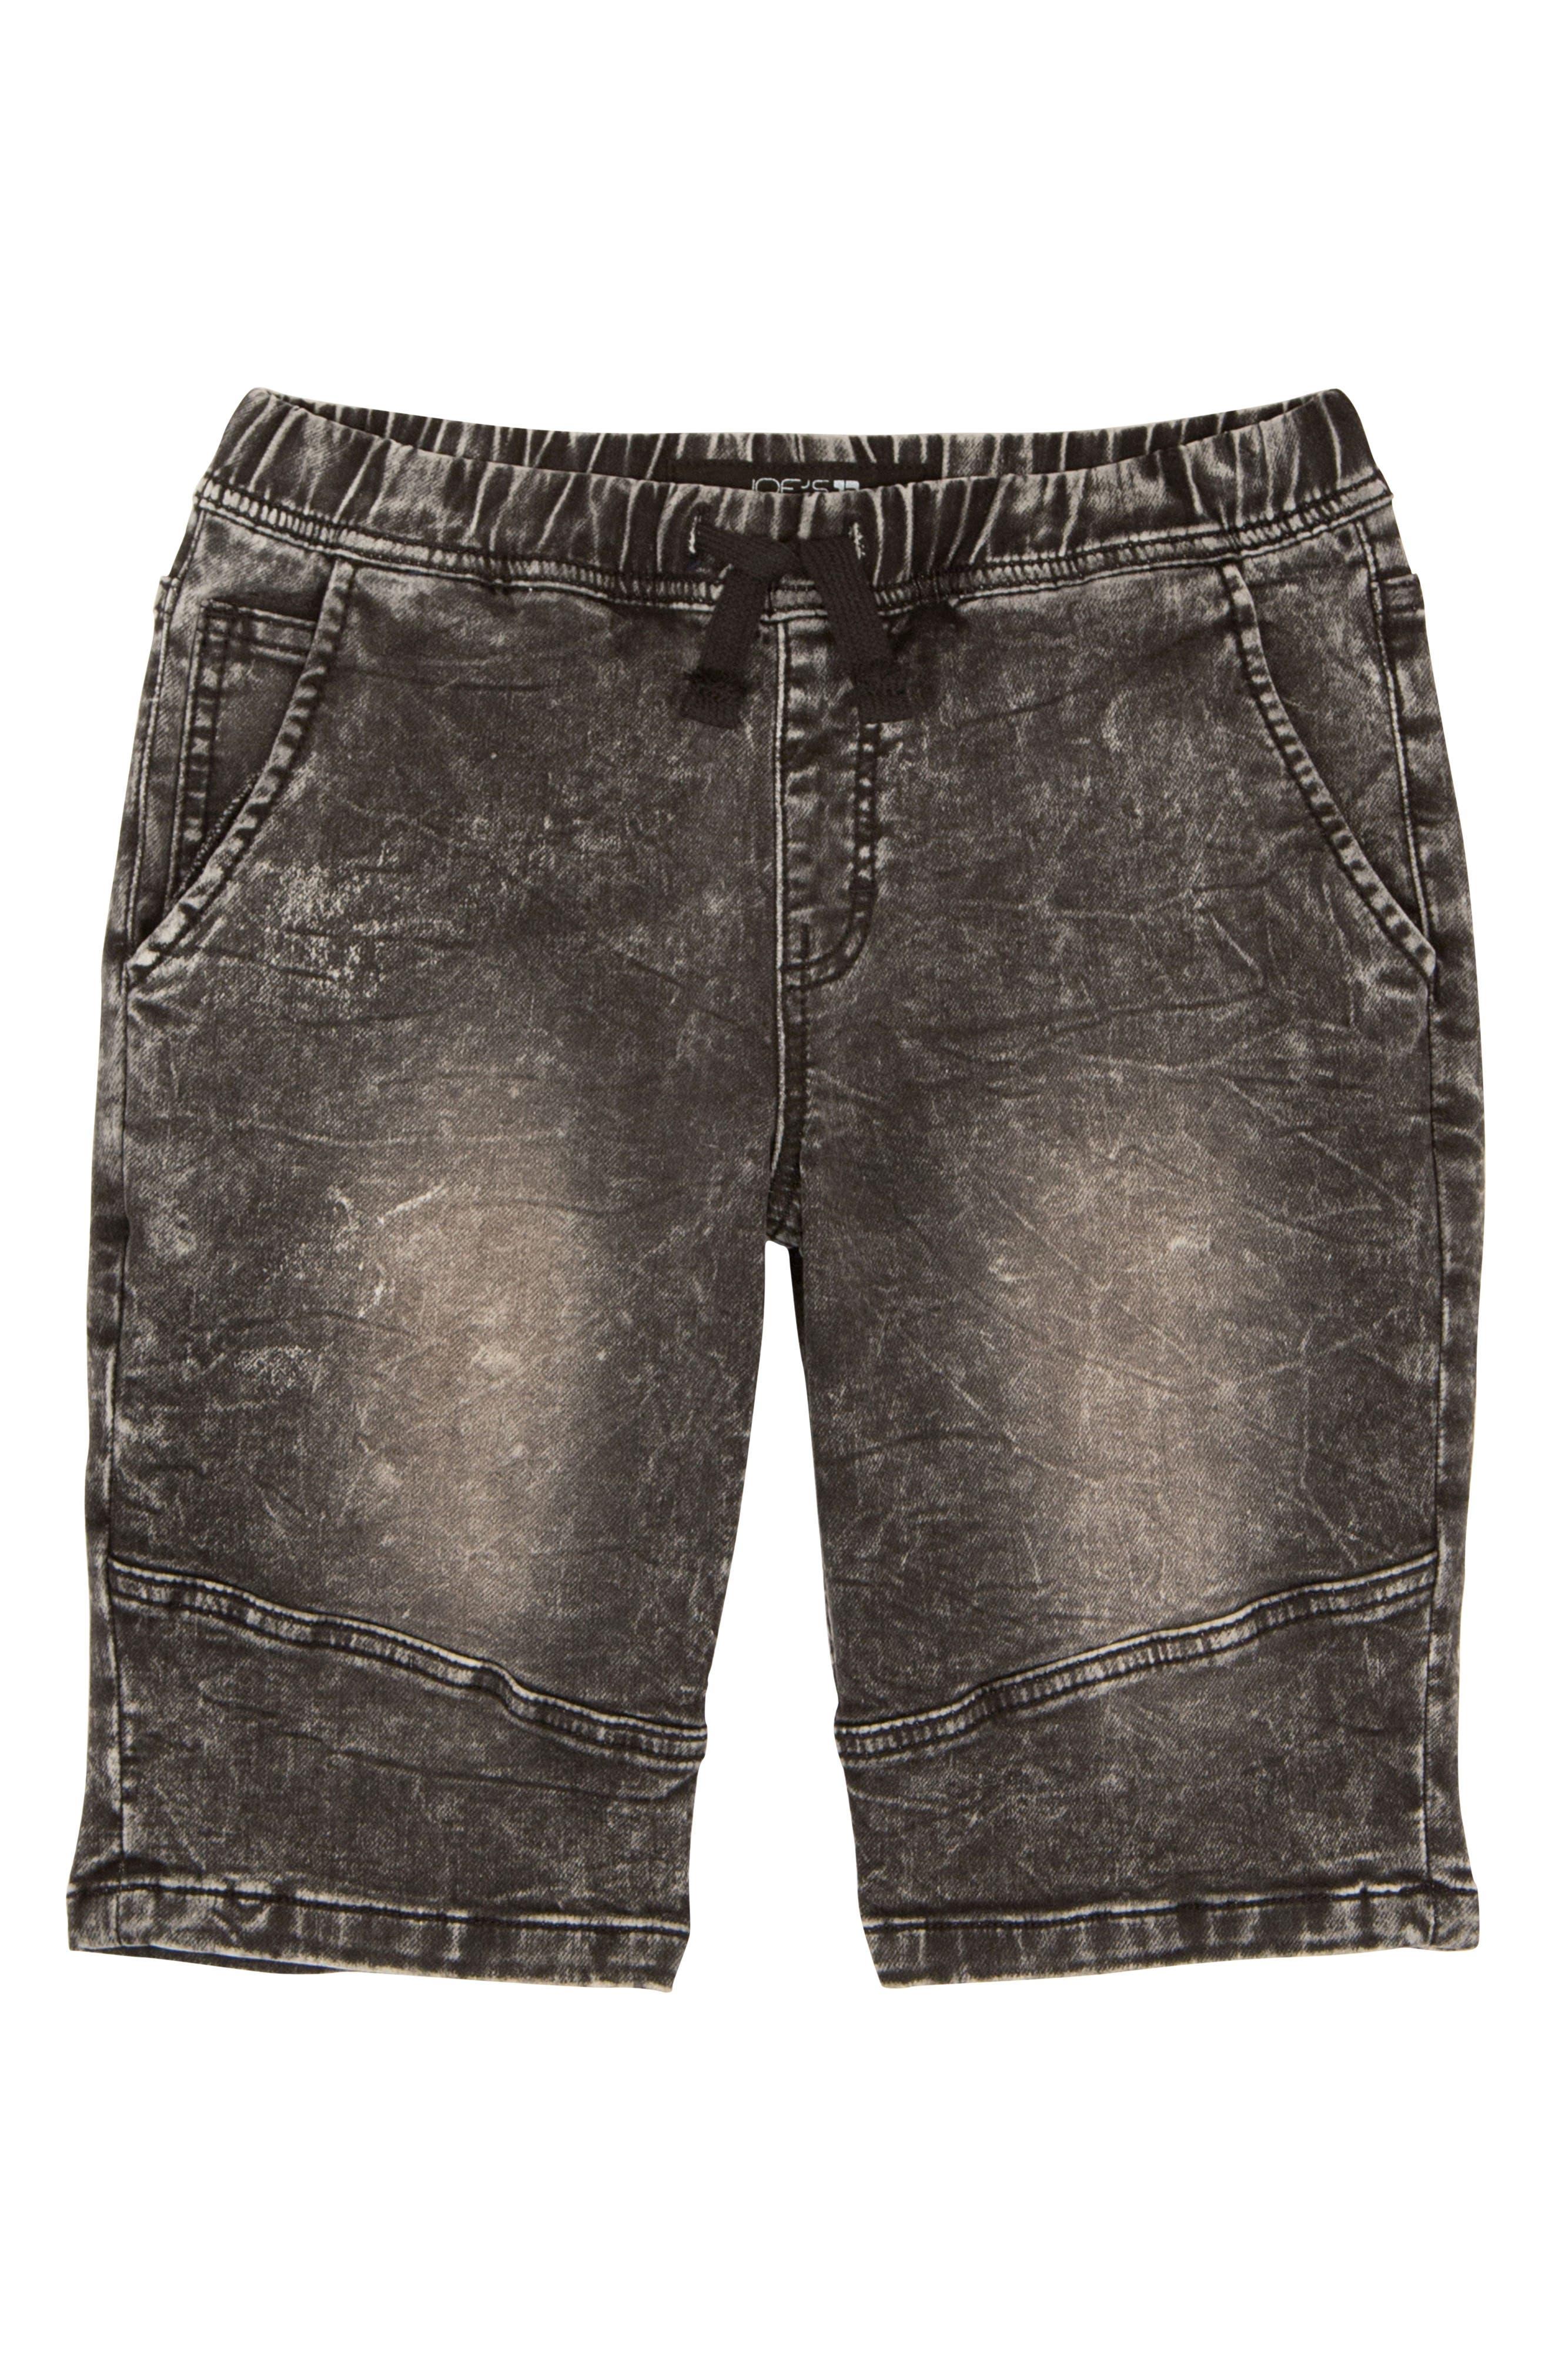 Joe's The Jogger Stretch Denim Shorts (Big Boys)